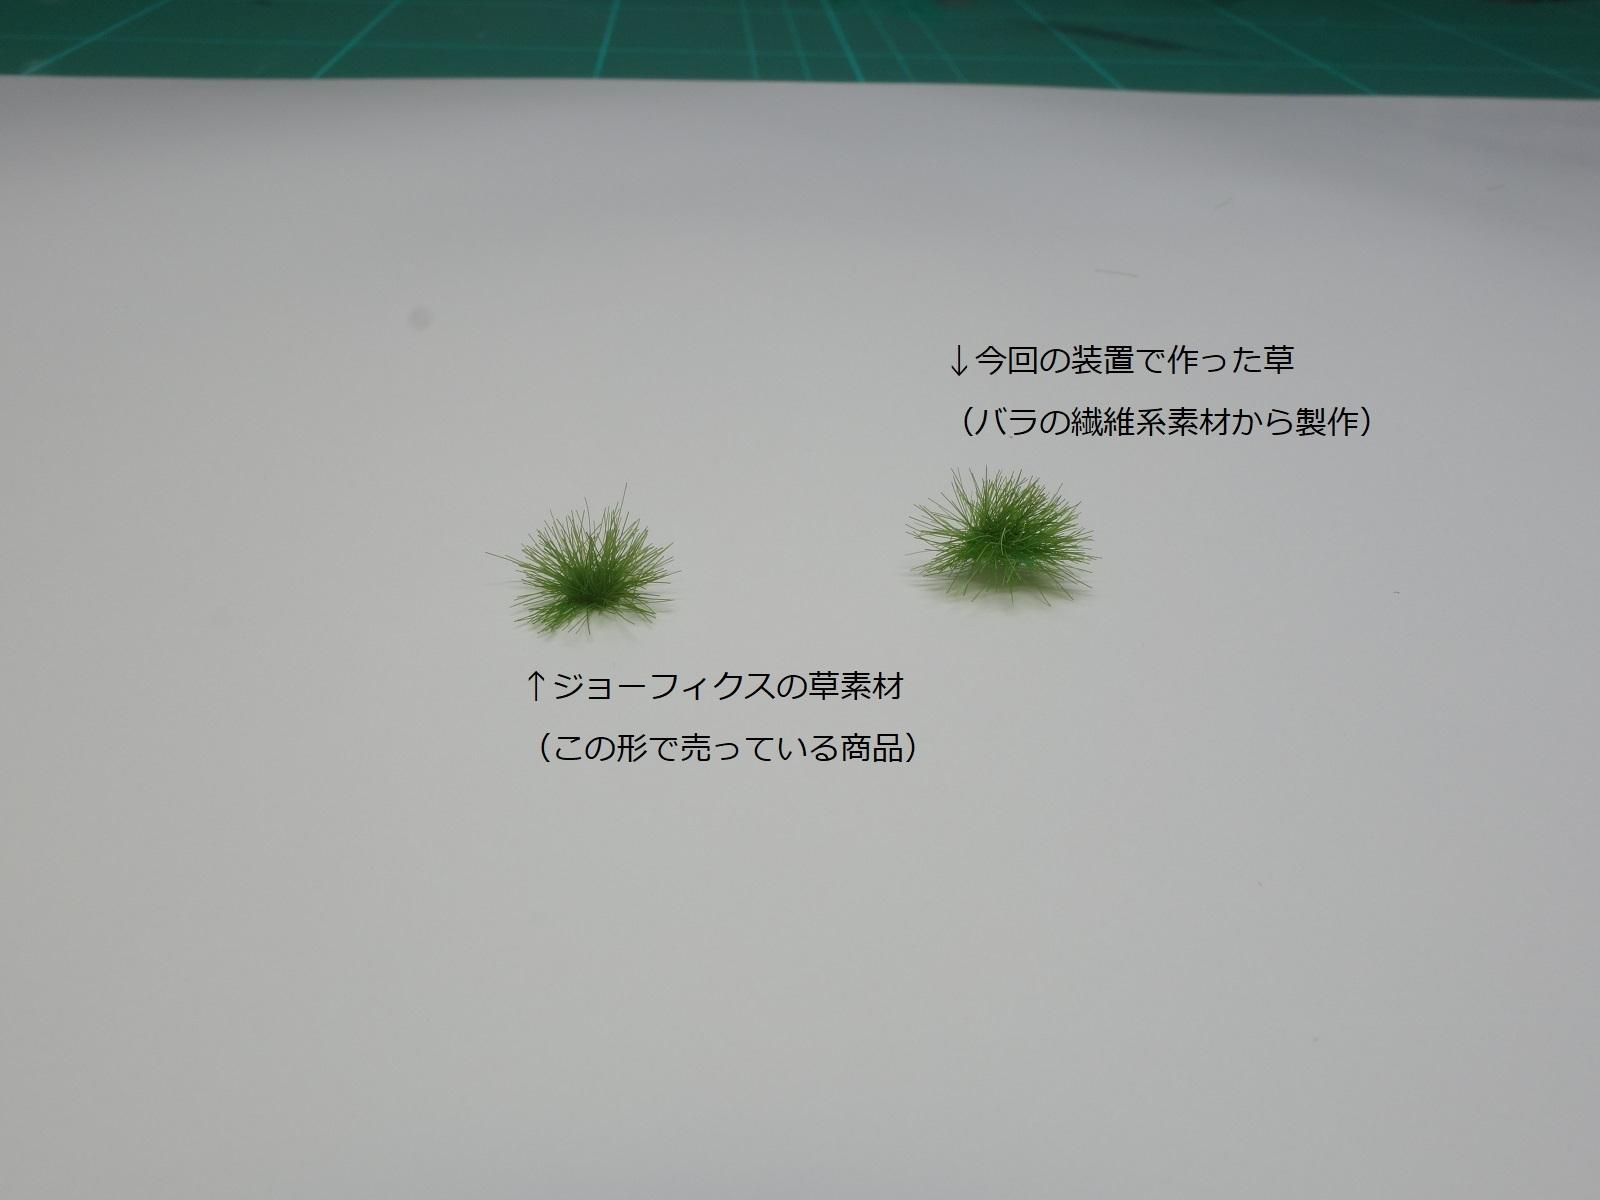 DSC03576up.jpg